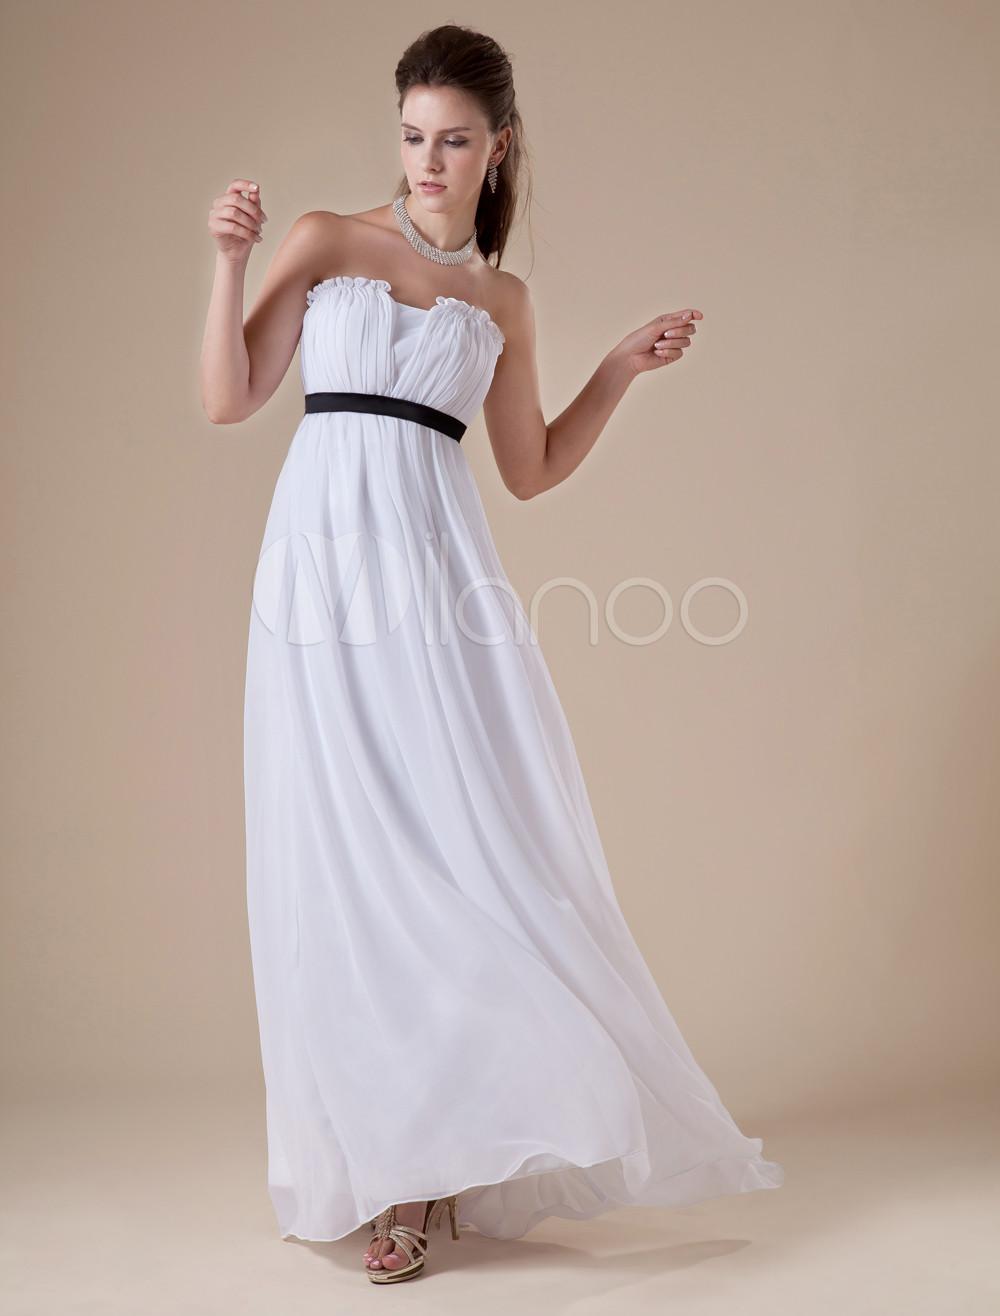 Elegent White Chiffon Black Sash Floor Length Womens Evening Dress